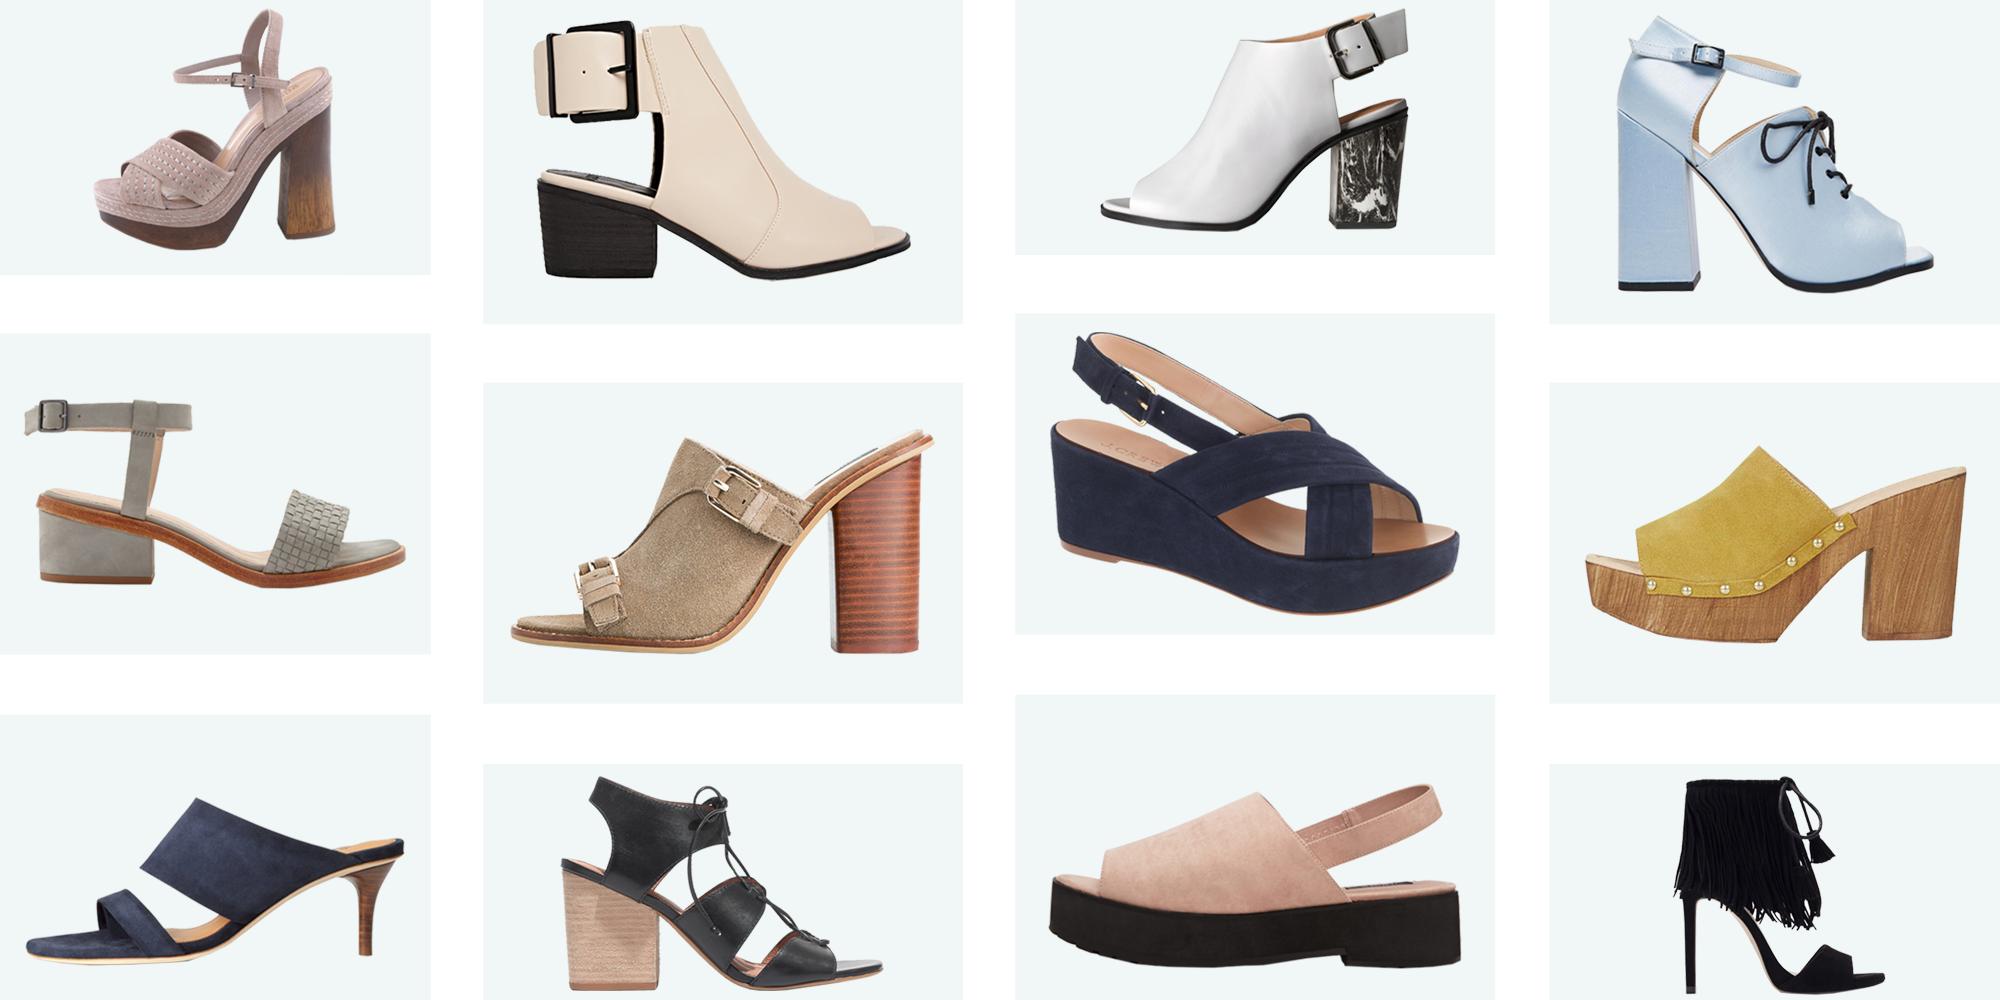 Open-Toe Shoes for Every Season - Cute